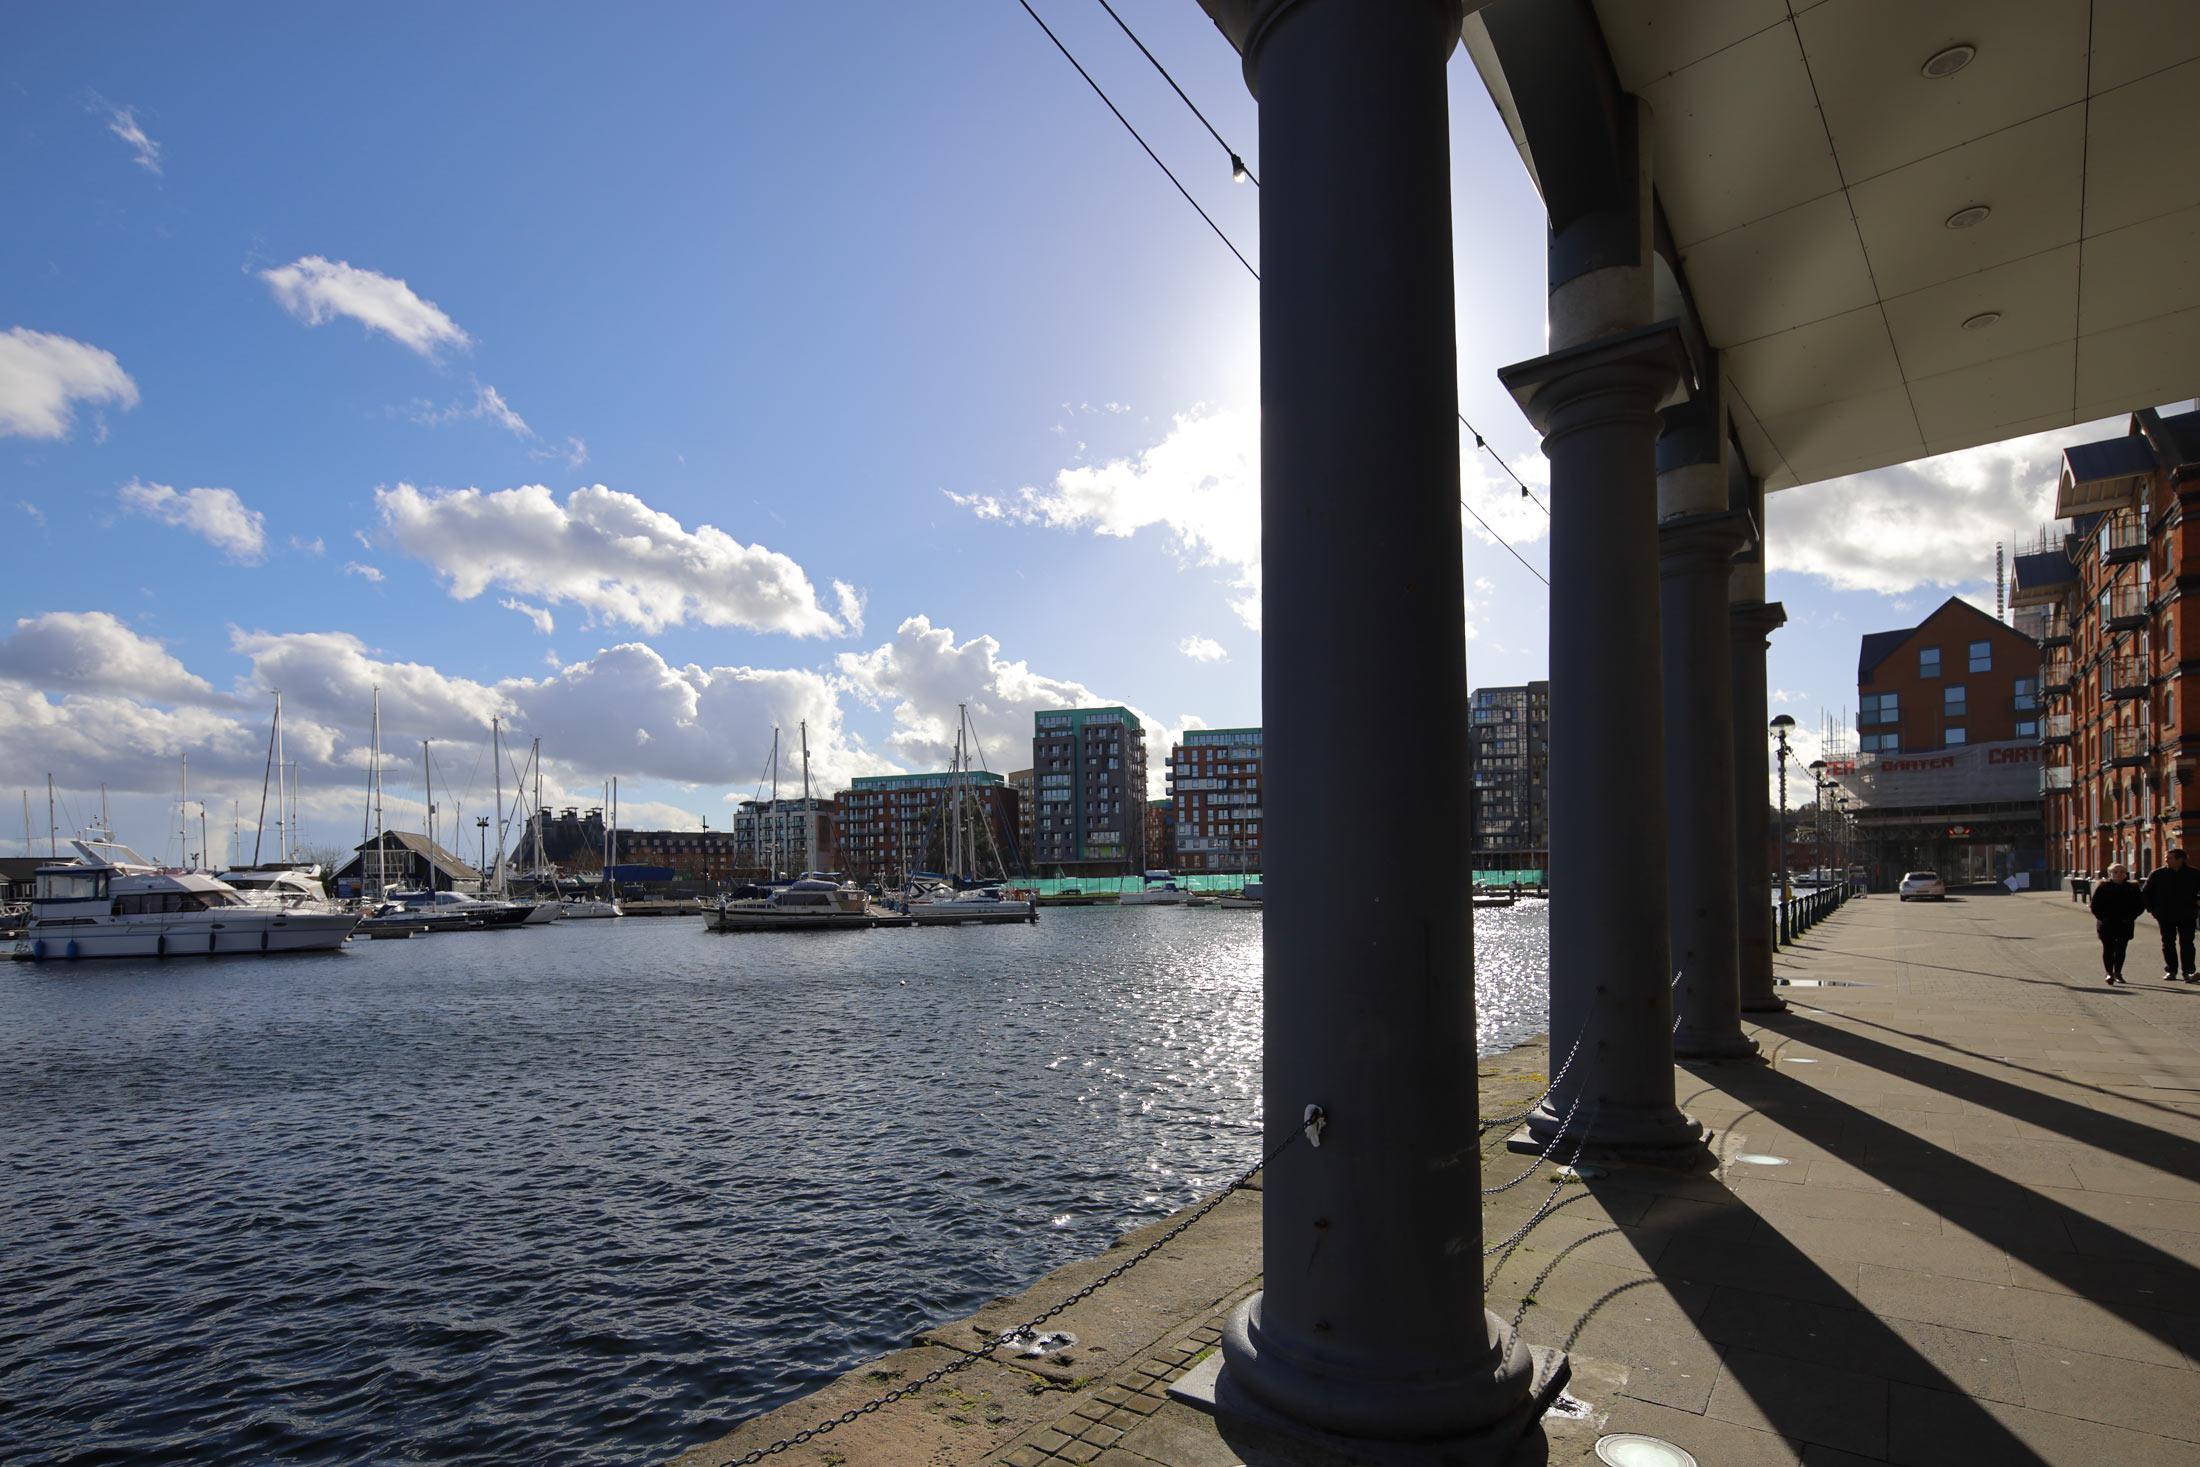 docks at Ipswich